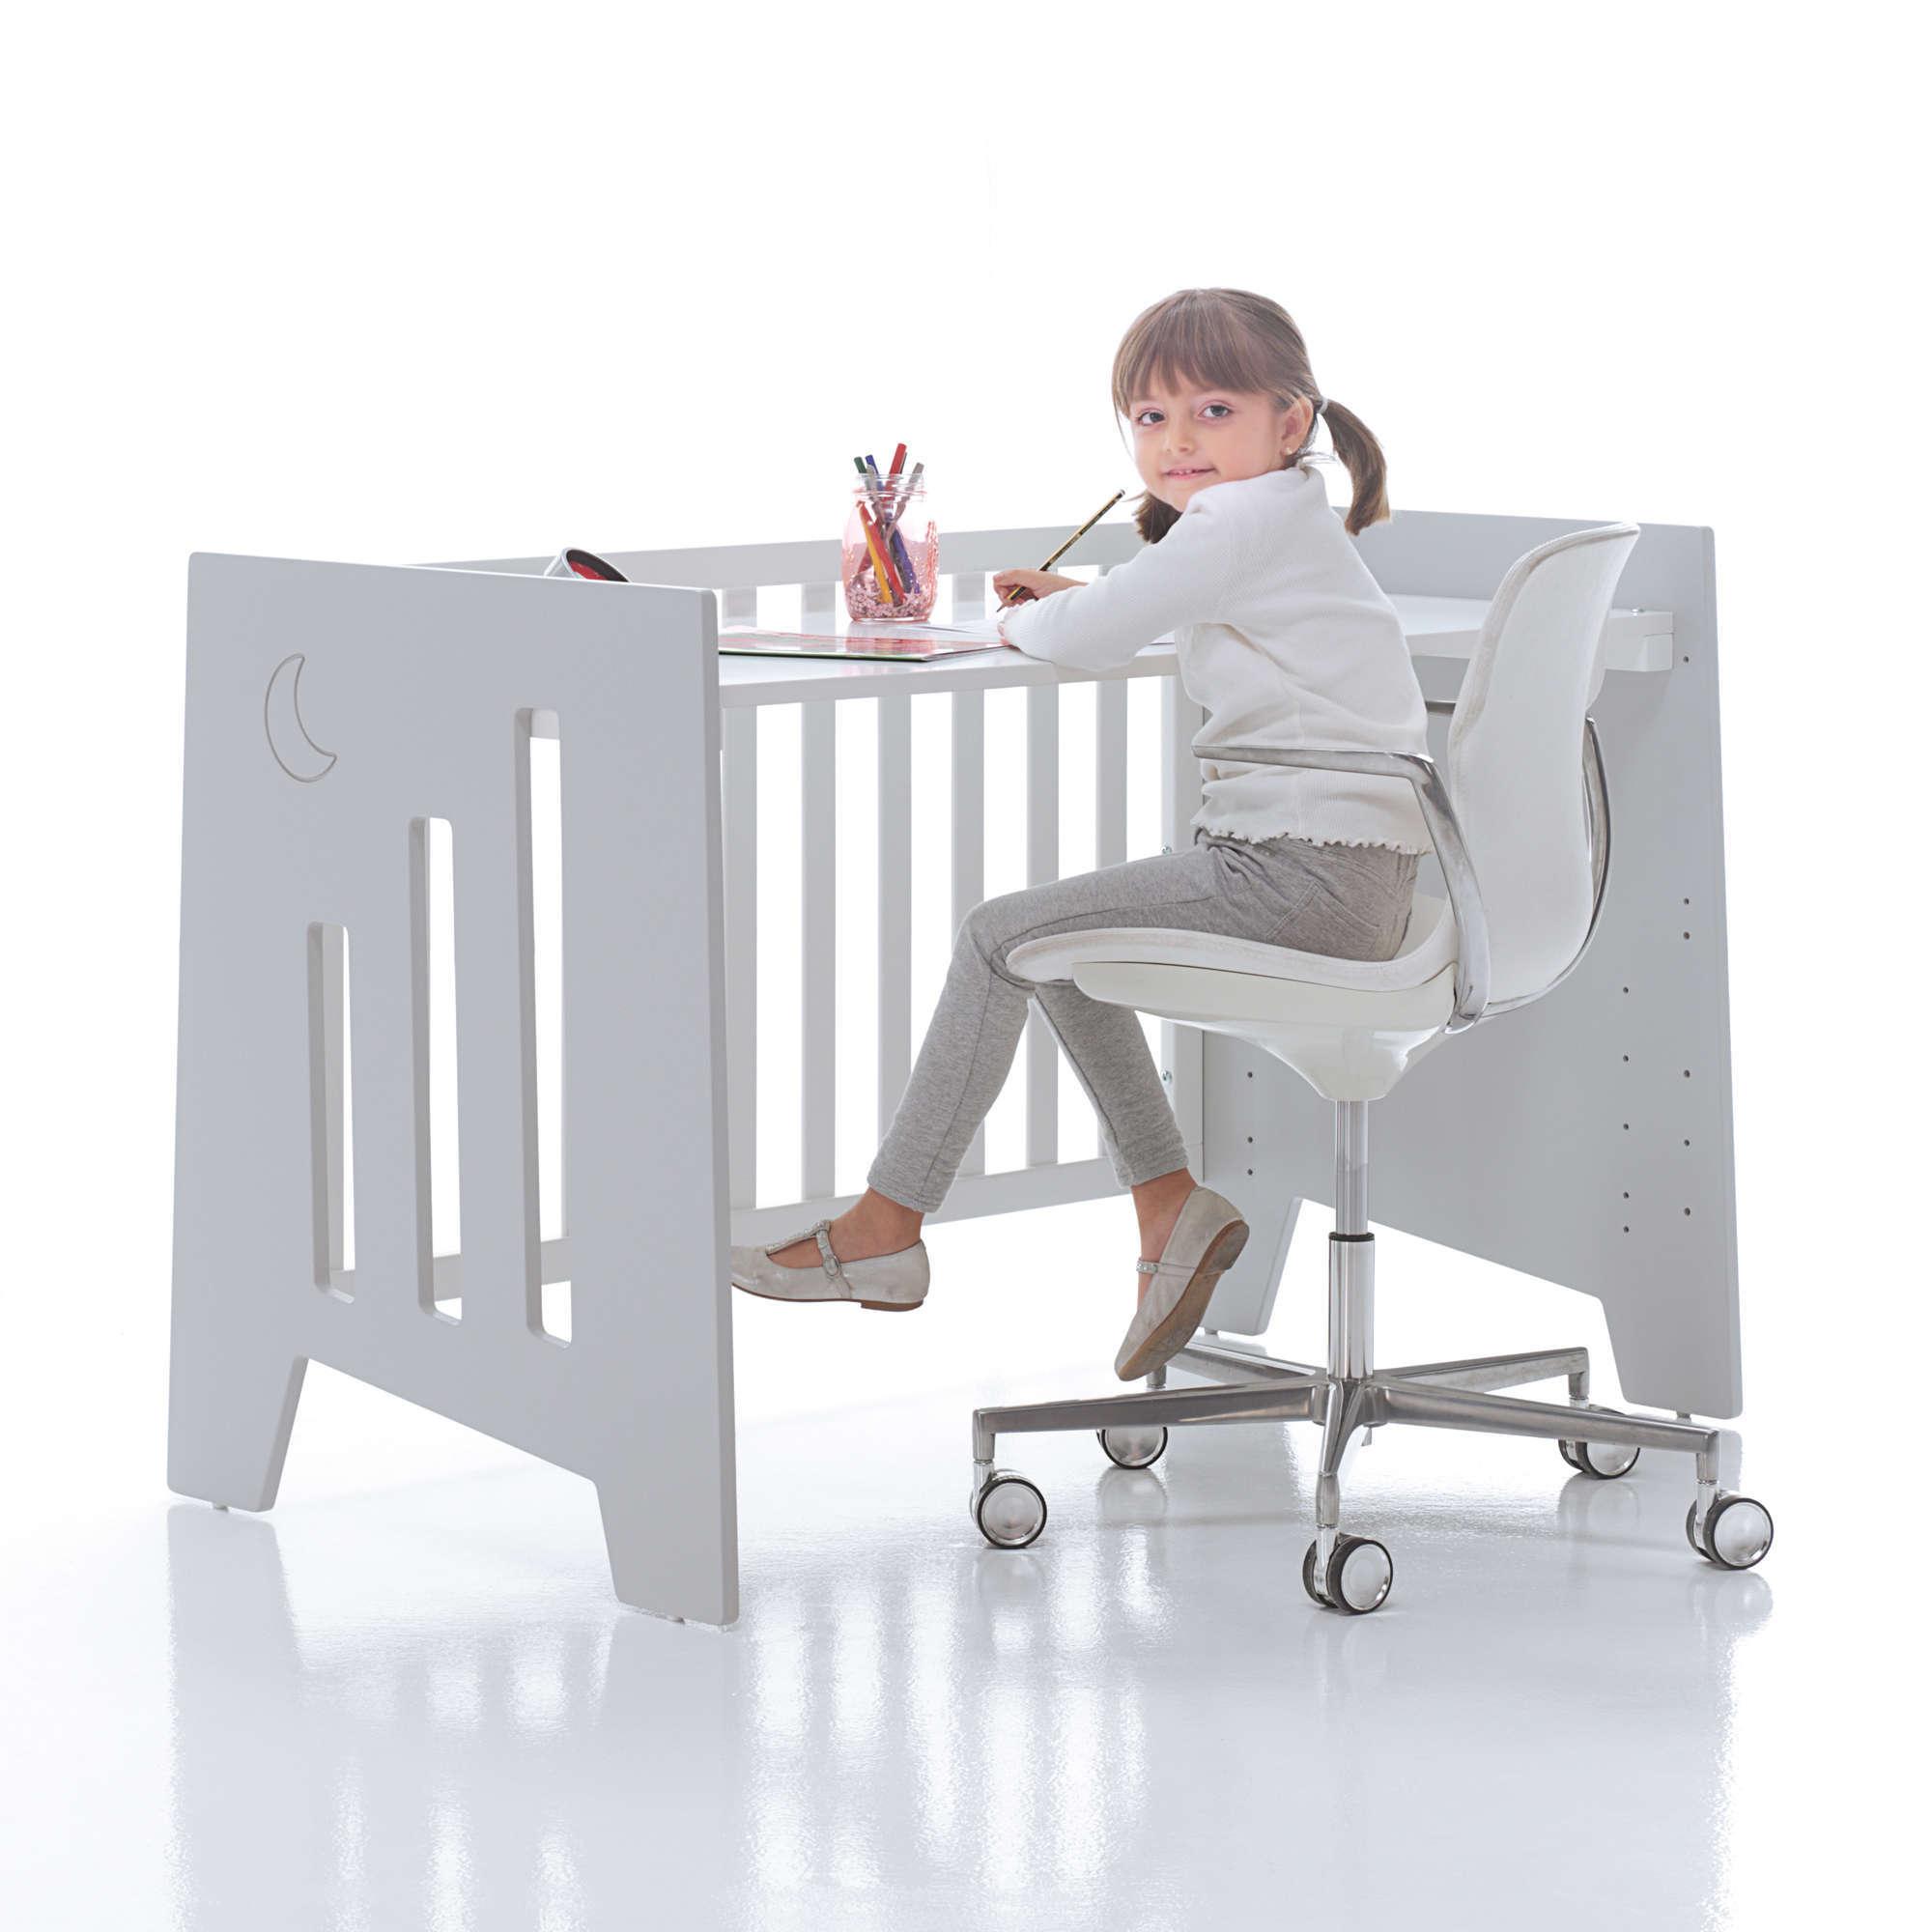 Cuna-escritorio Omni 5en1 60x120 Alondra